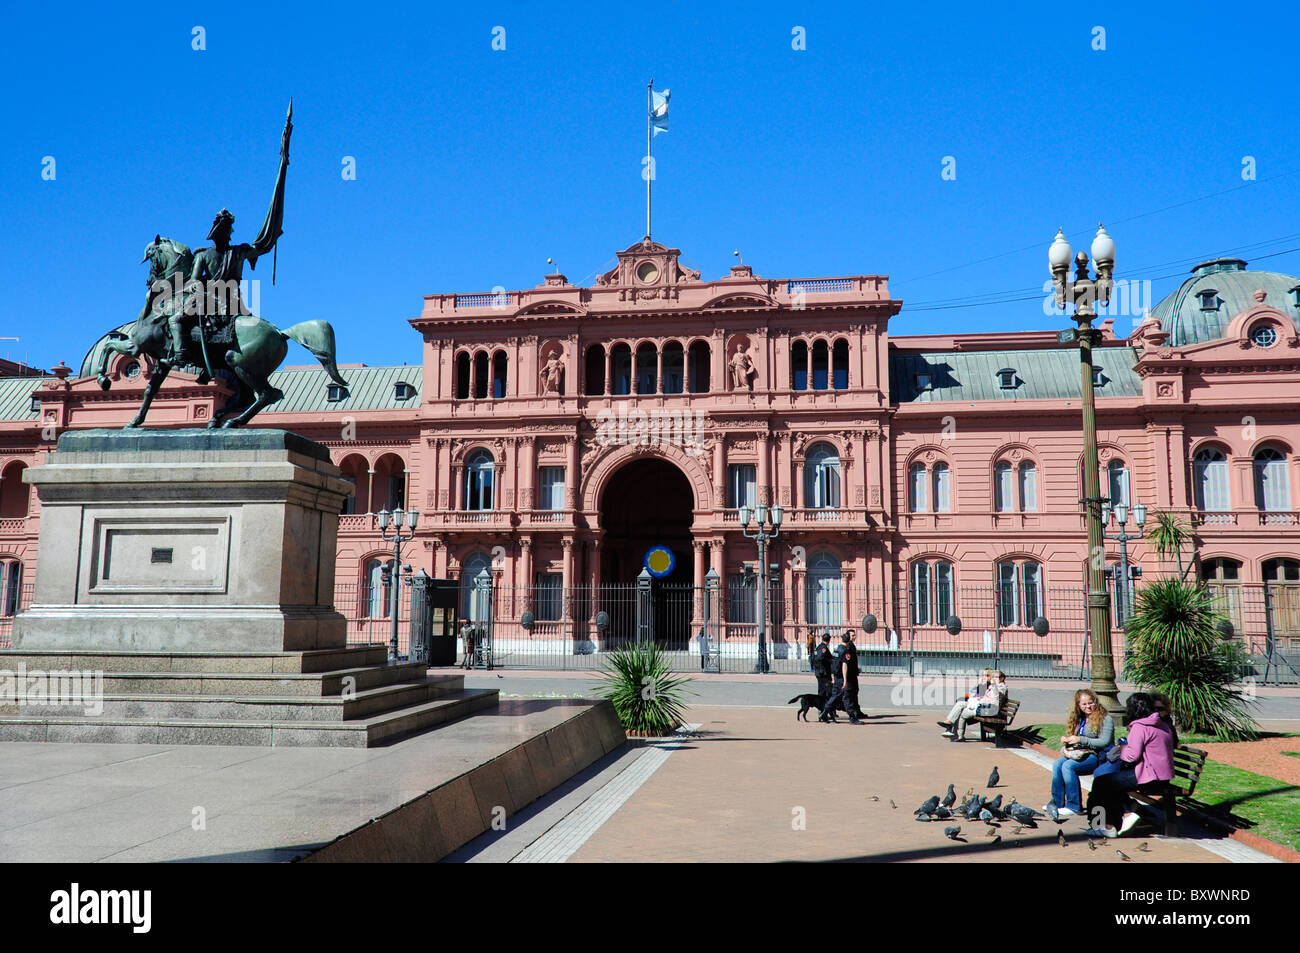 Casa Rosada presidential palace and General San Martin statue, Plaza de Mayo, Buenos Aires, Argentina, South America - Stock Image